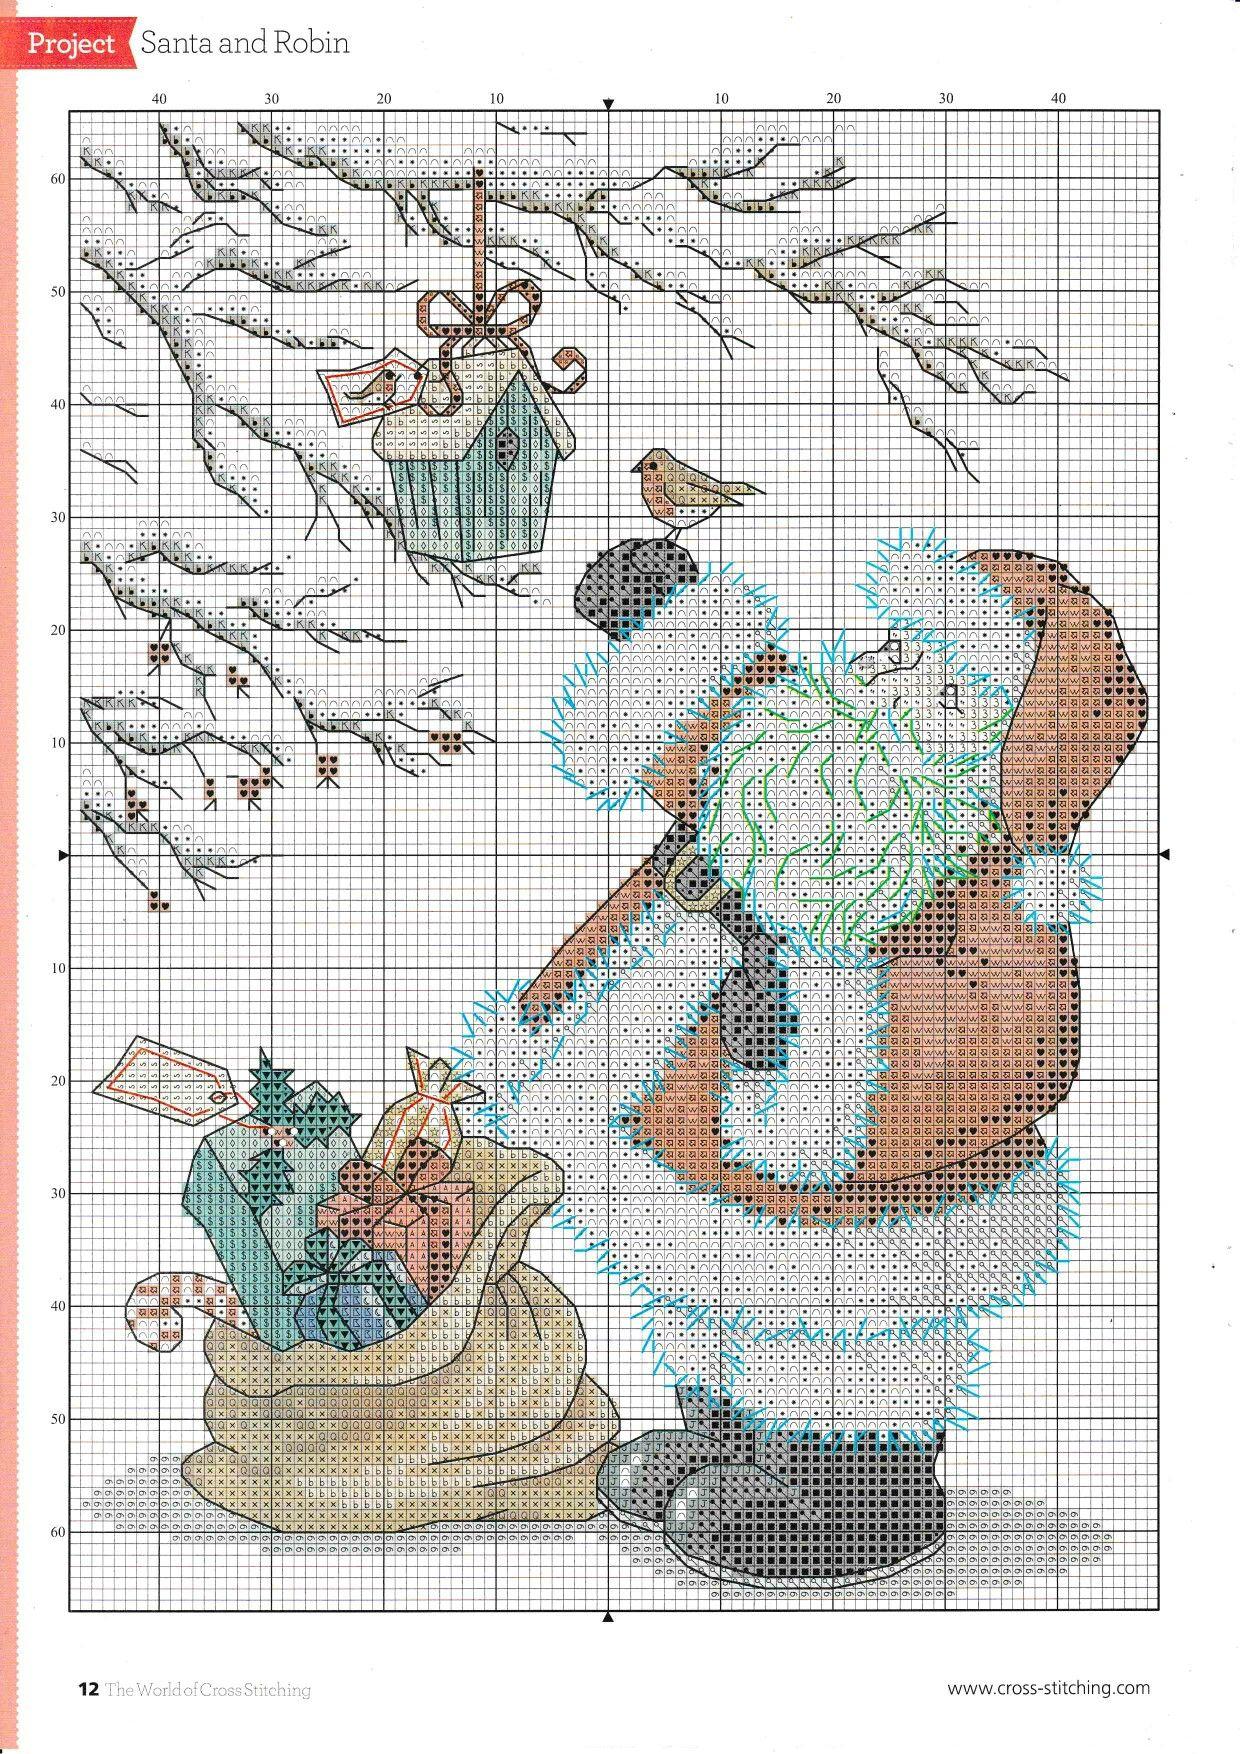 Pin de Cristina Basaran en Cross Stitch | Pinterest